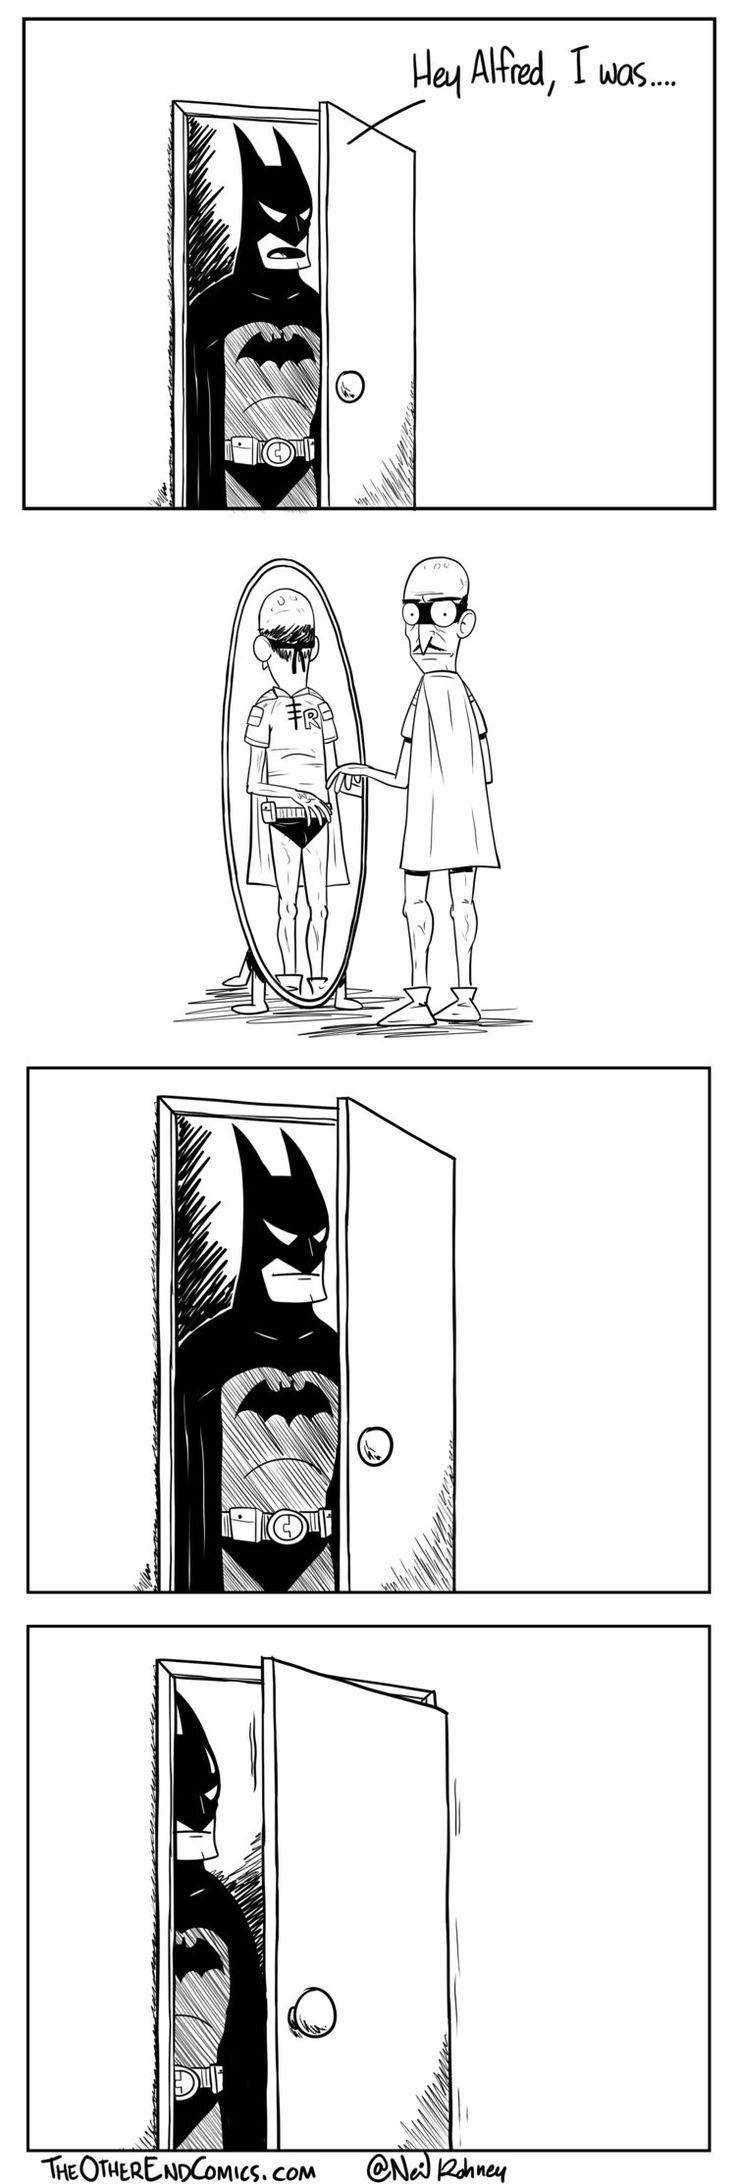 Batman comic strip black and white dresses